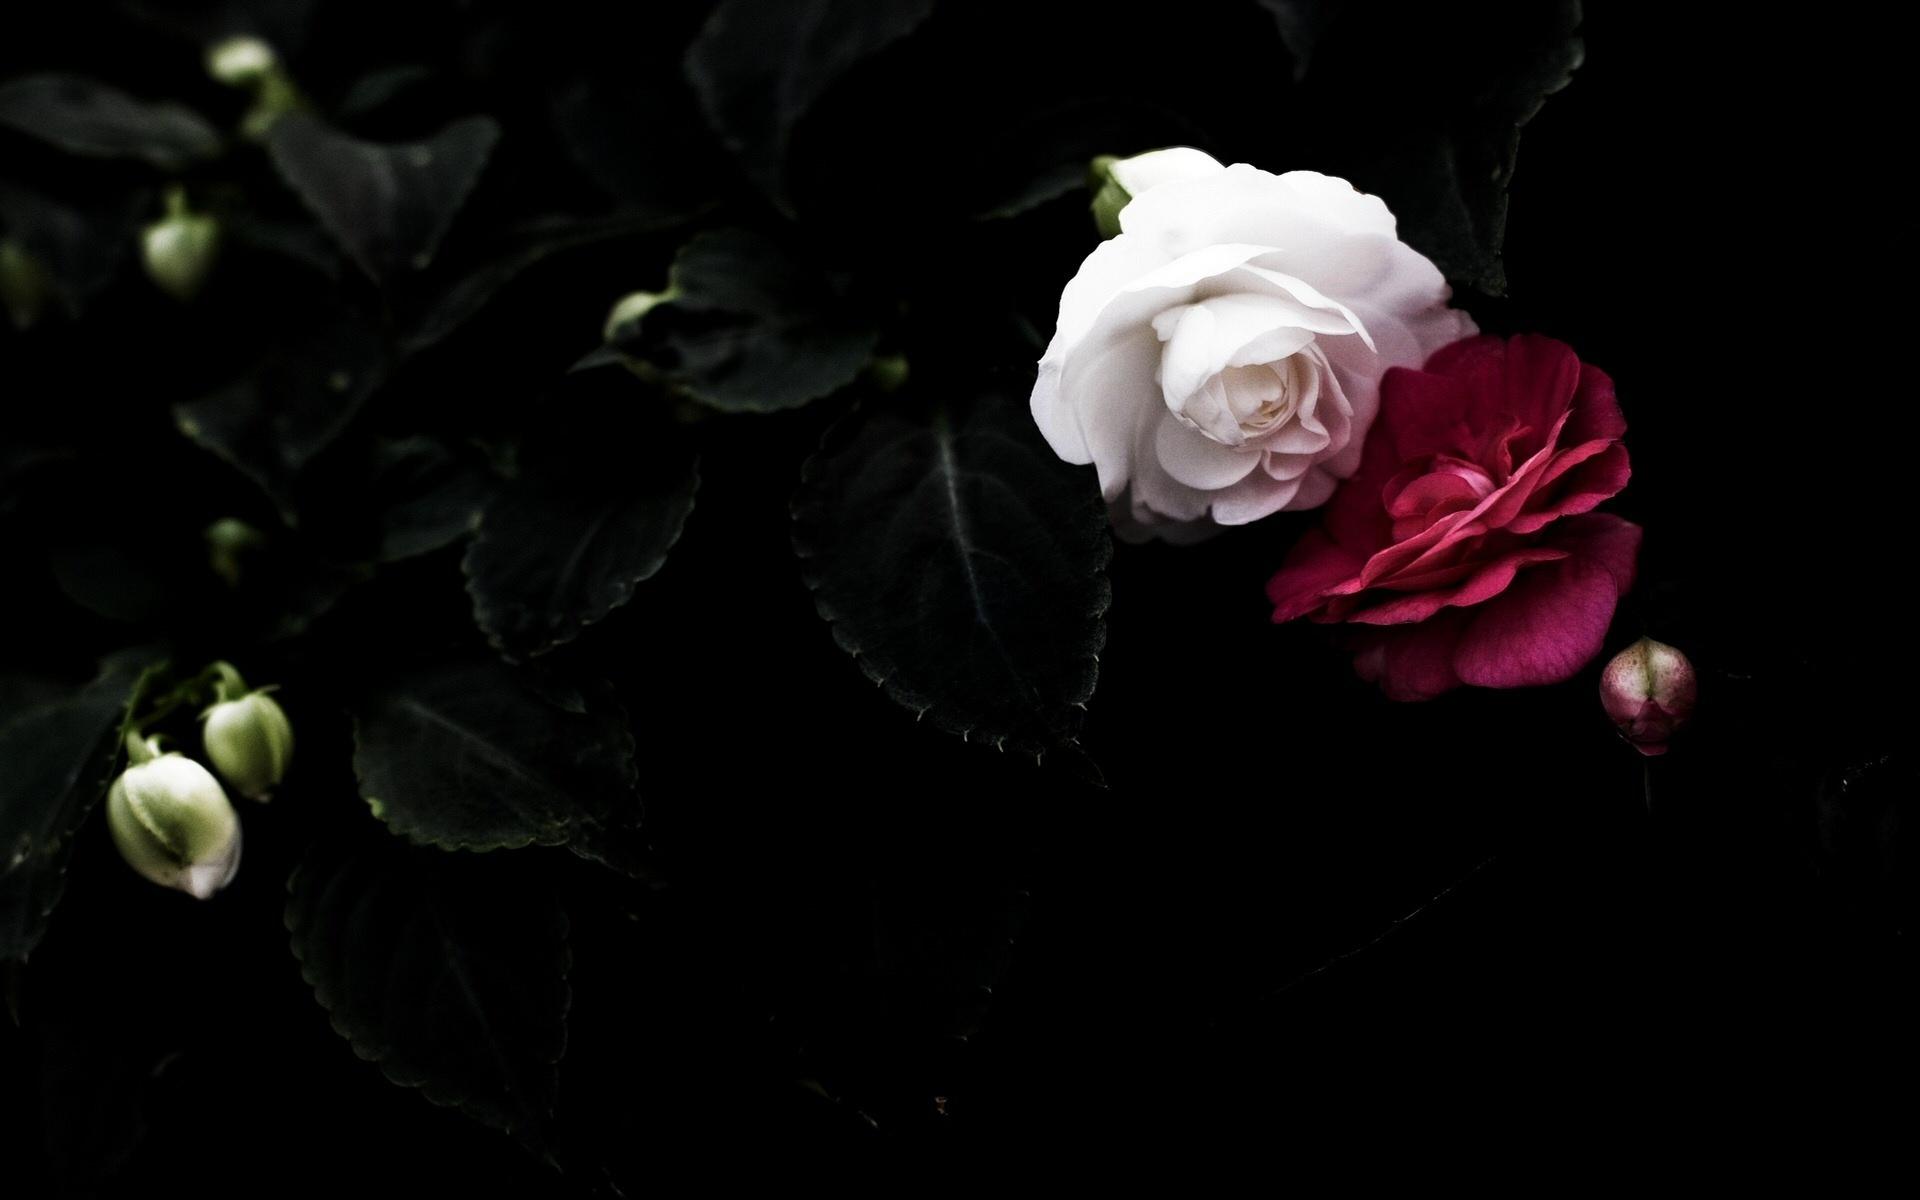 Download Roses Wallpaper Black White Leaf Pair White Red Petals